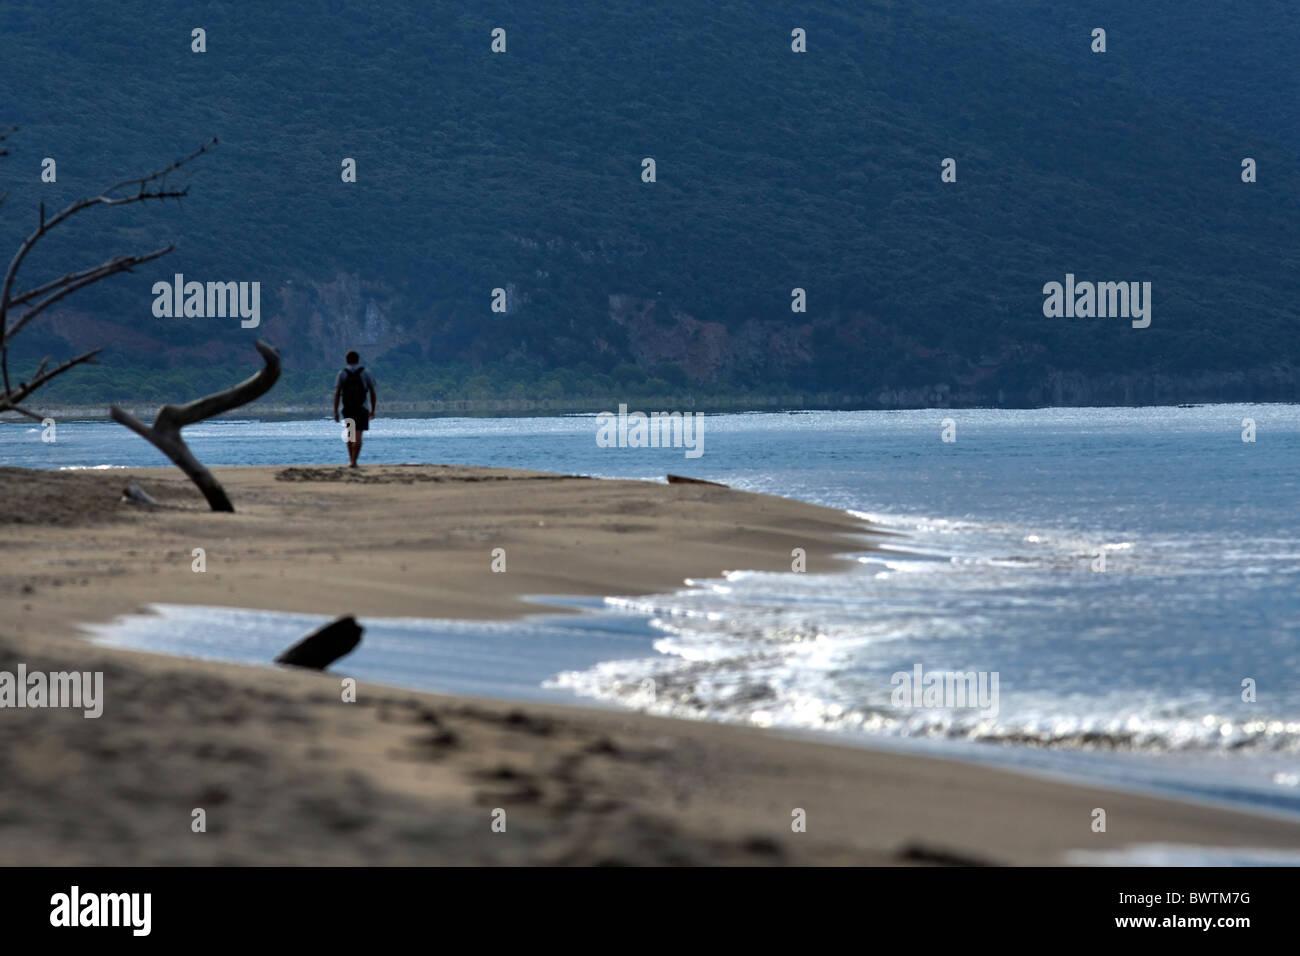 Man walking along the wild beach of Parco Naturale della Maremma, symbolic picture,Tuscany, Italy - Stock Image